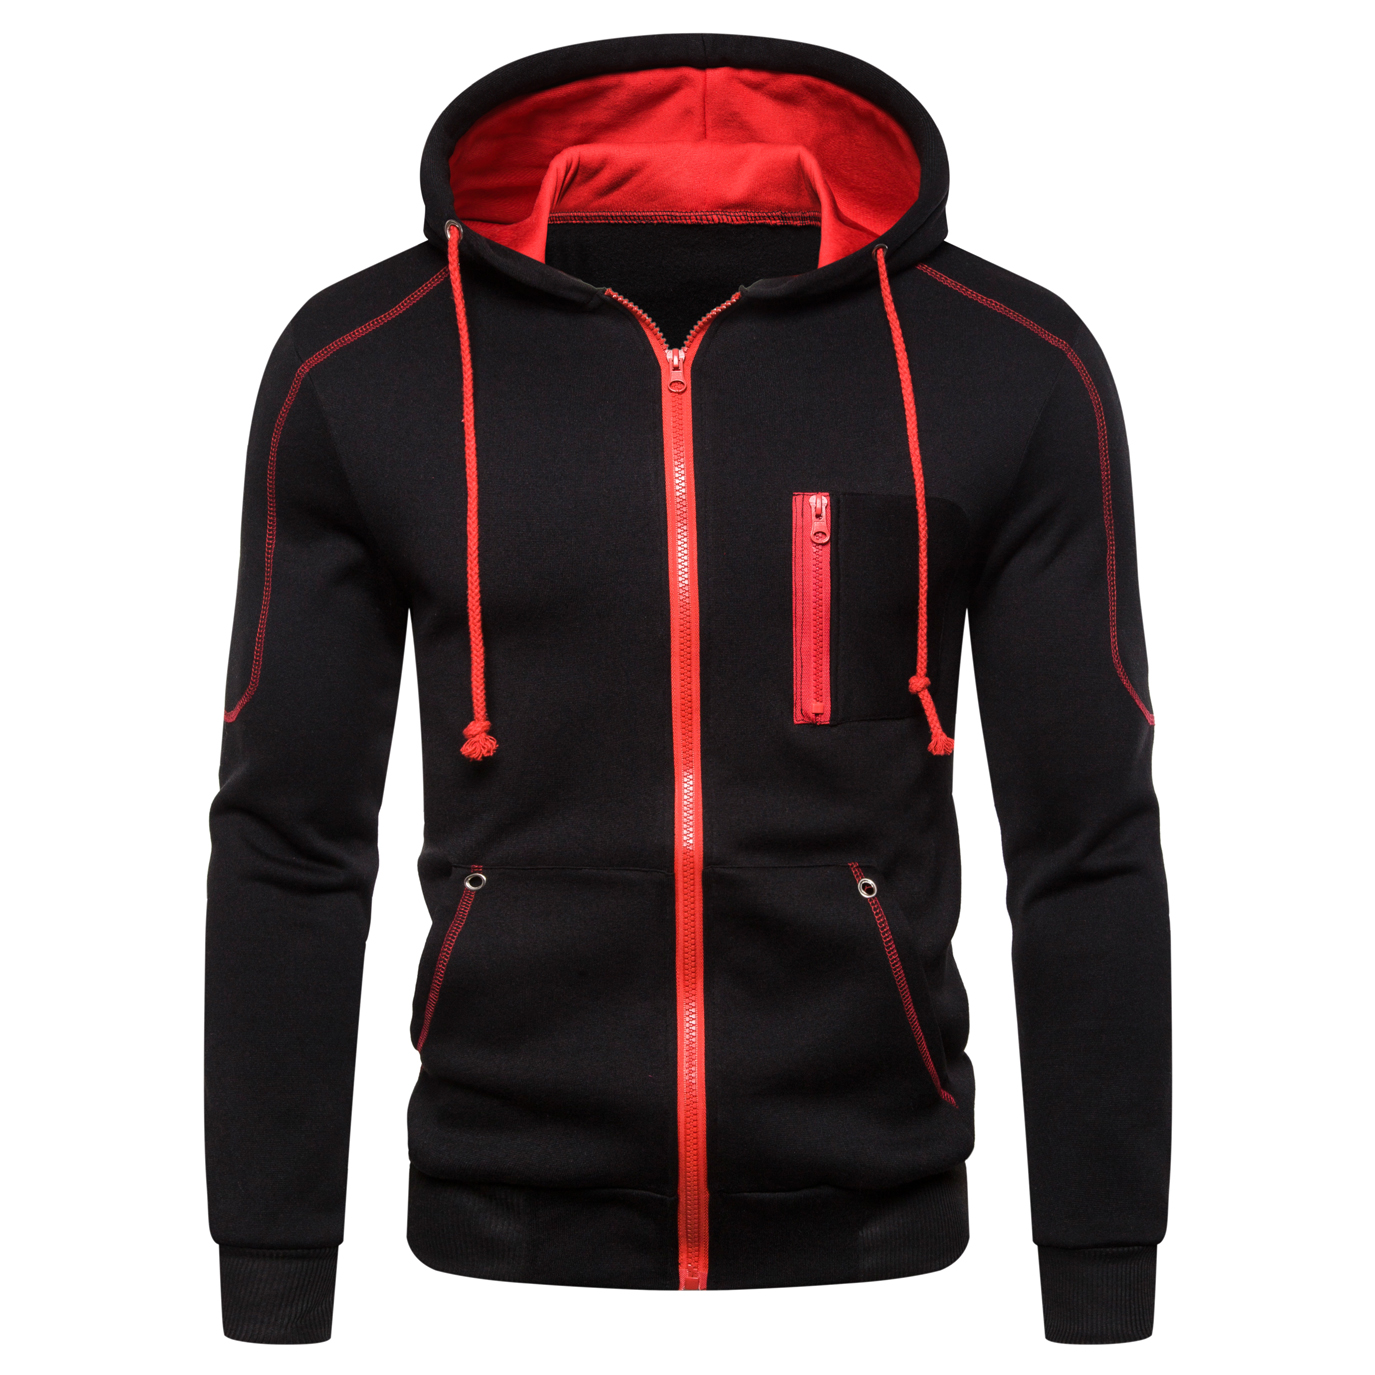 95% Cotton Custom LOGO Clothing men Sweatshirts Hooded Pullover sweatershirts male/Women sudaderas cry baby Streetwear Hoodie